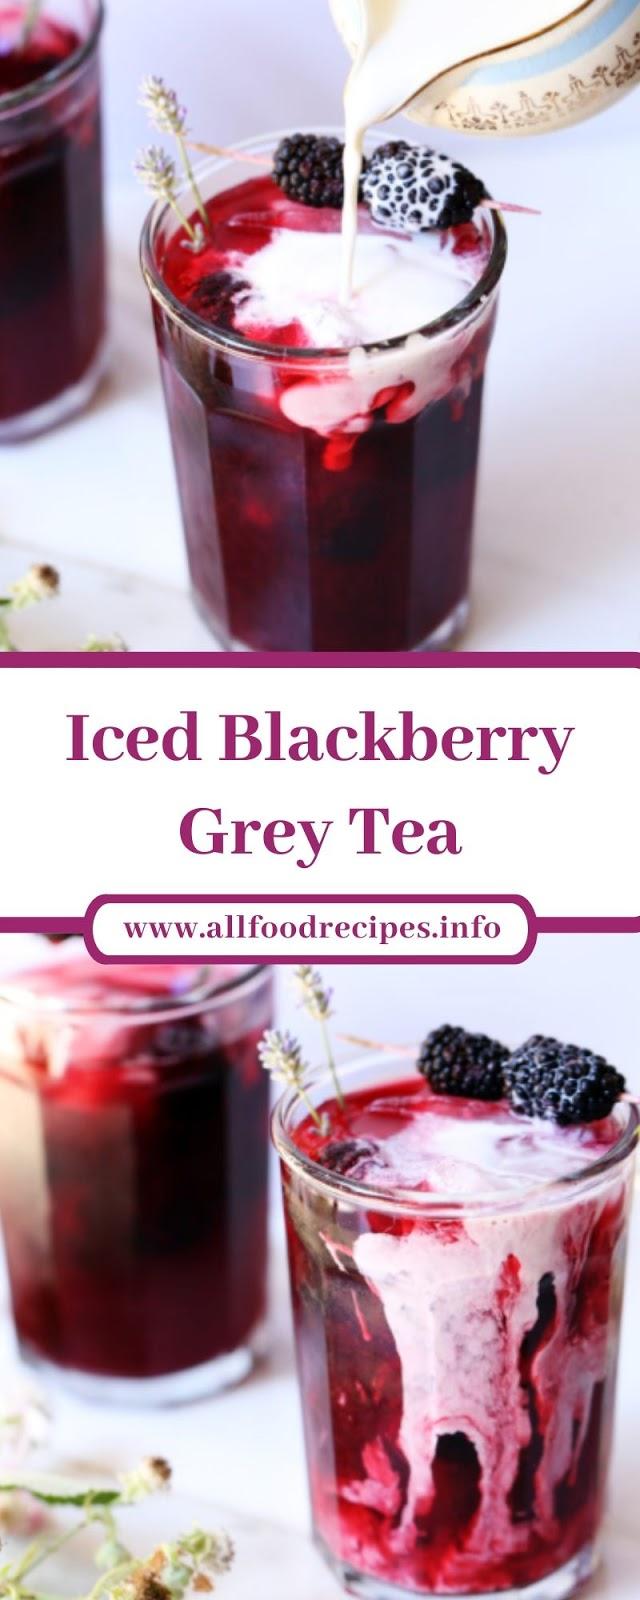 Iced Blackberry Grey Tea